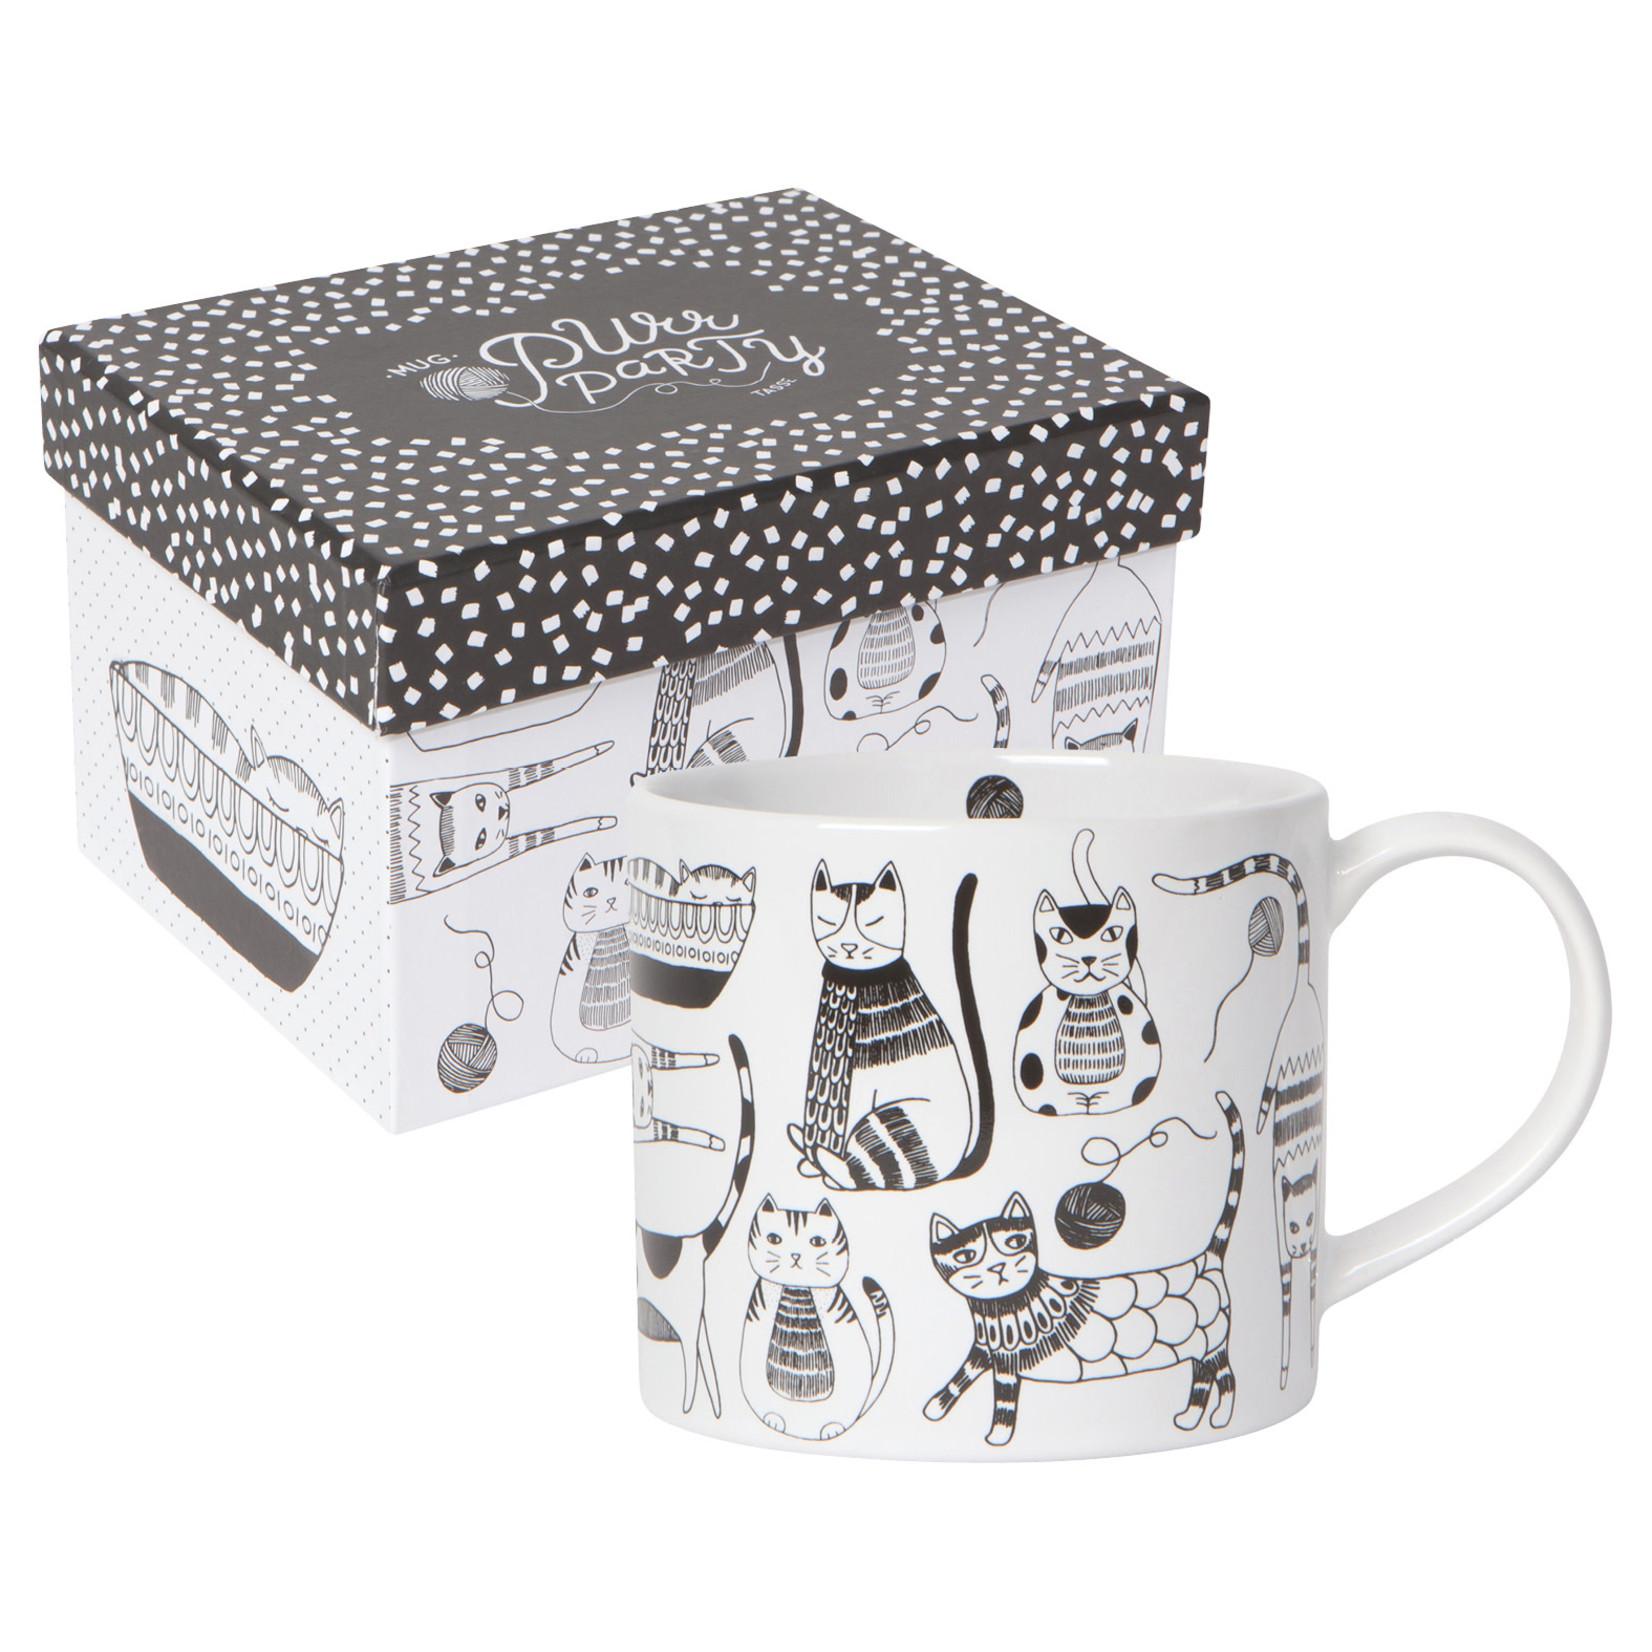 Mug in a Box - Purr Party